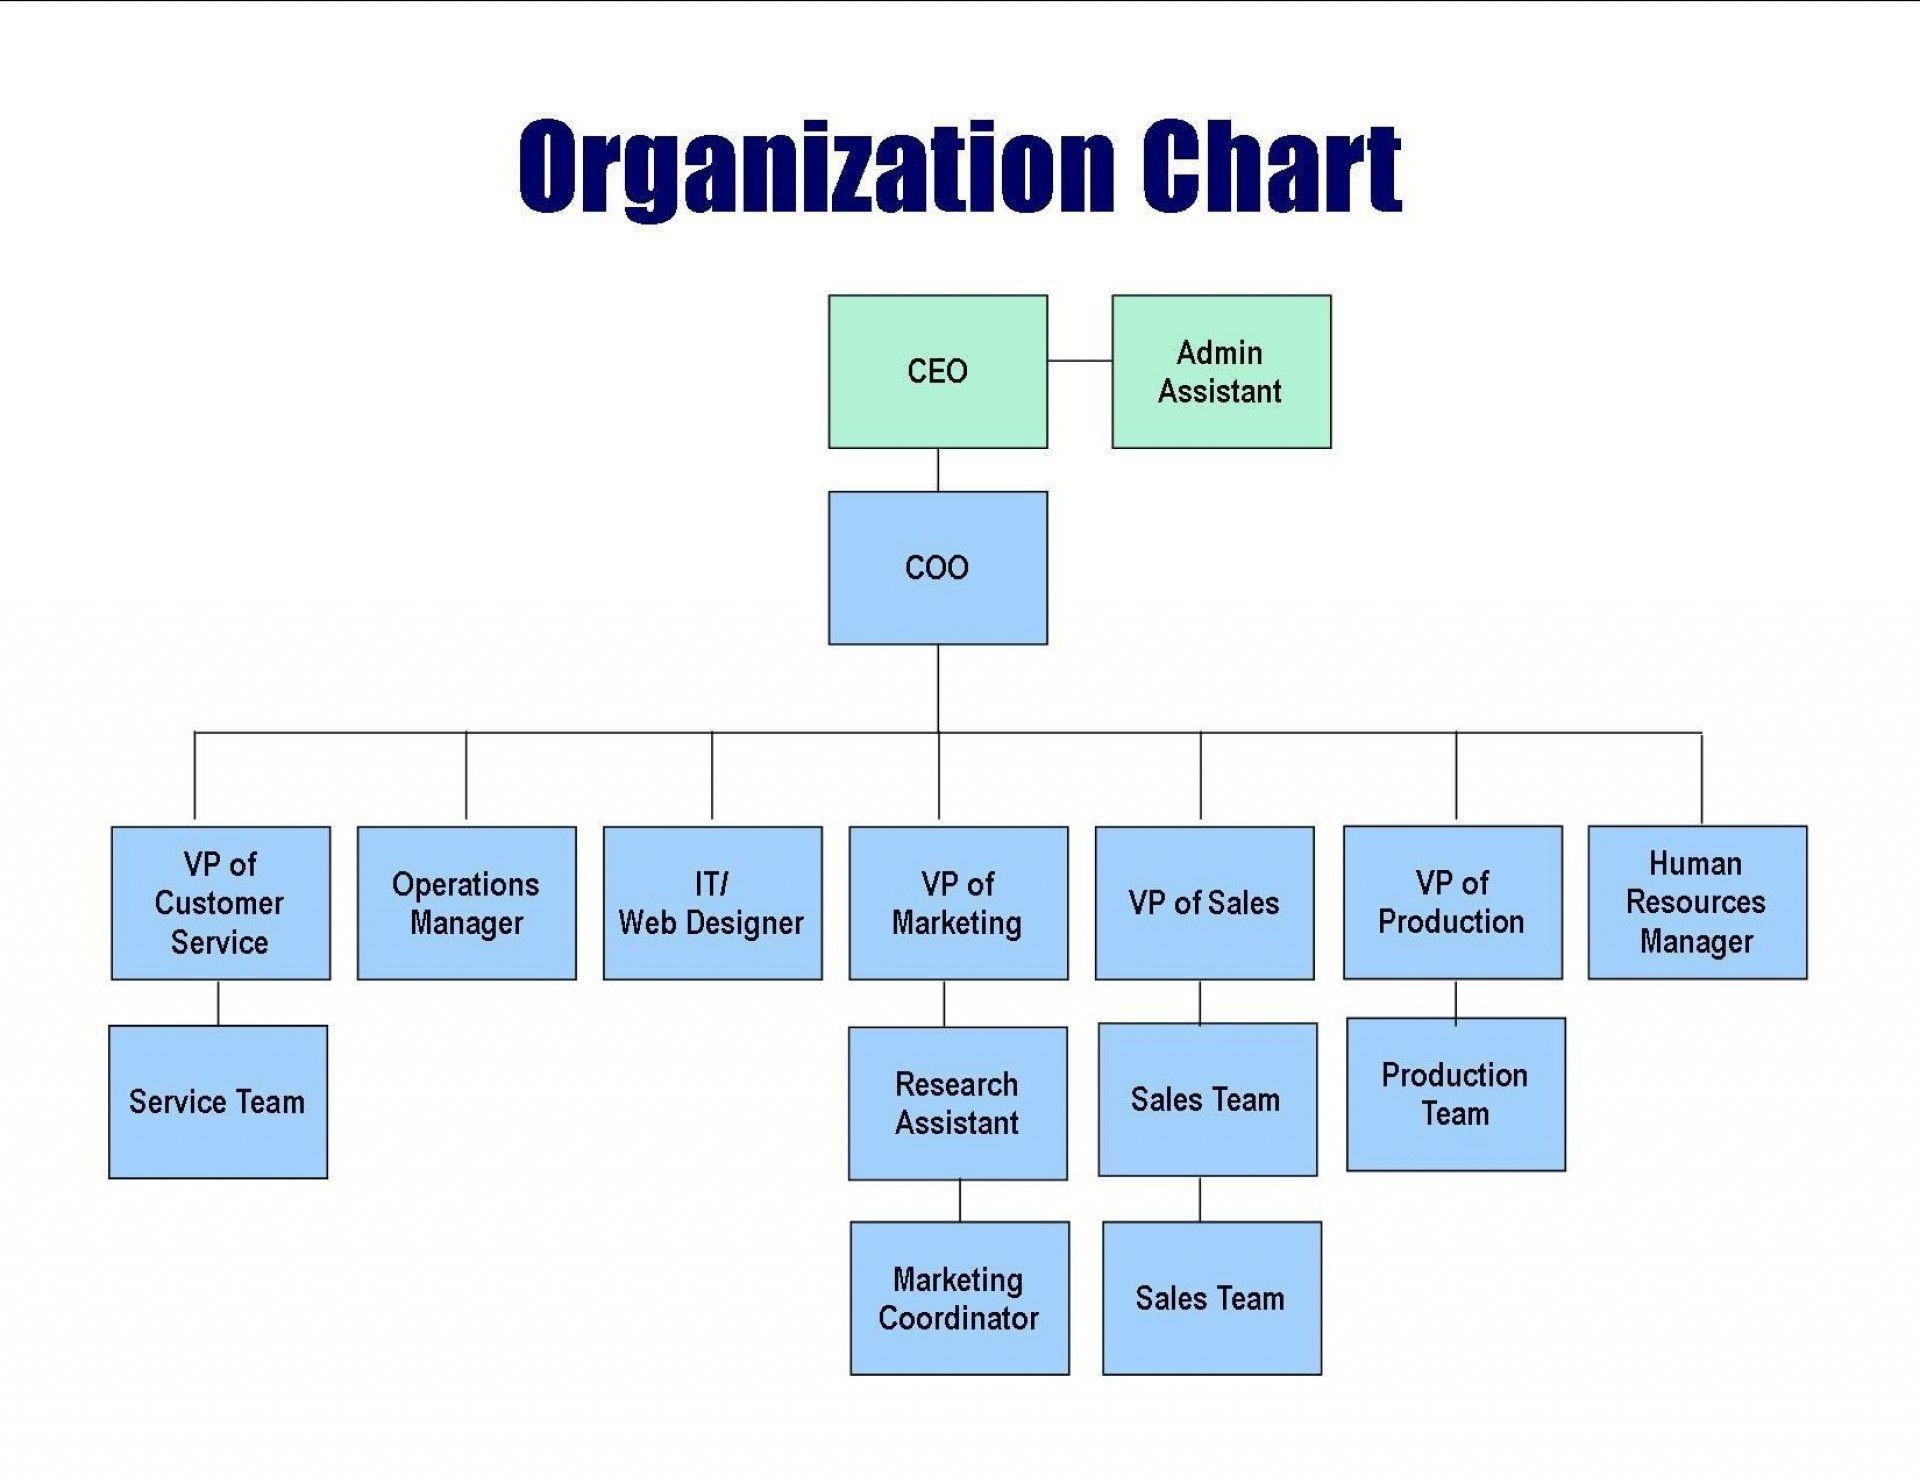 009 Unbelievable Organization Chart Template Word 2013 Photo  Organizational Free MicrosoftFull